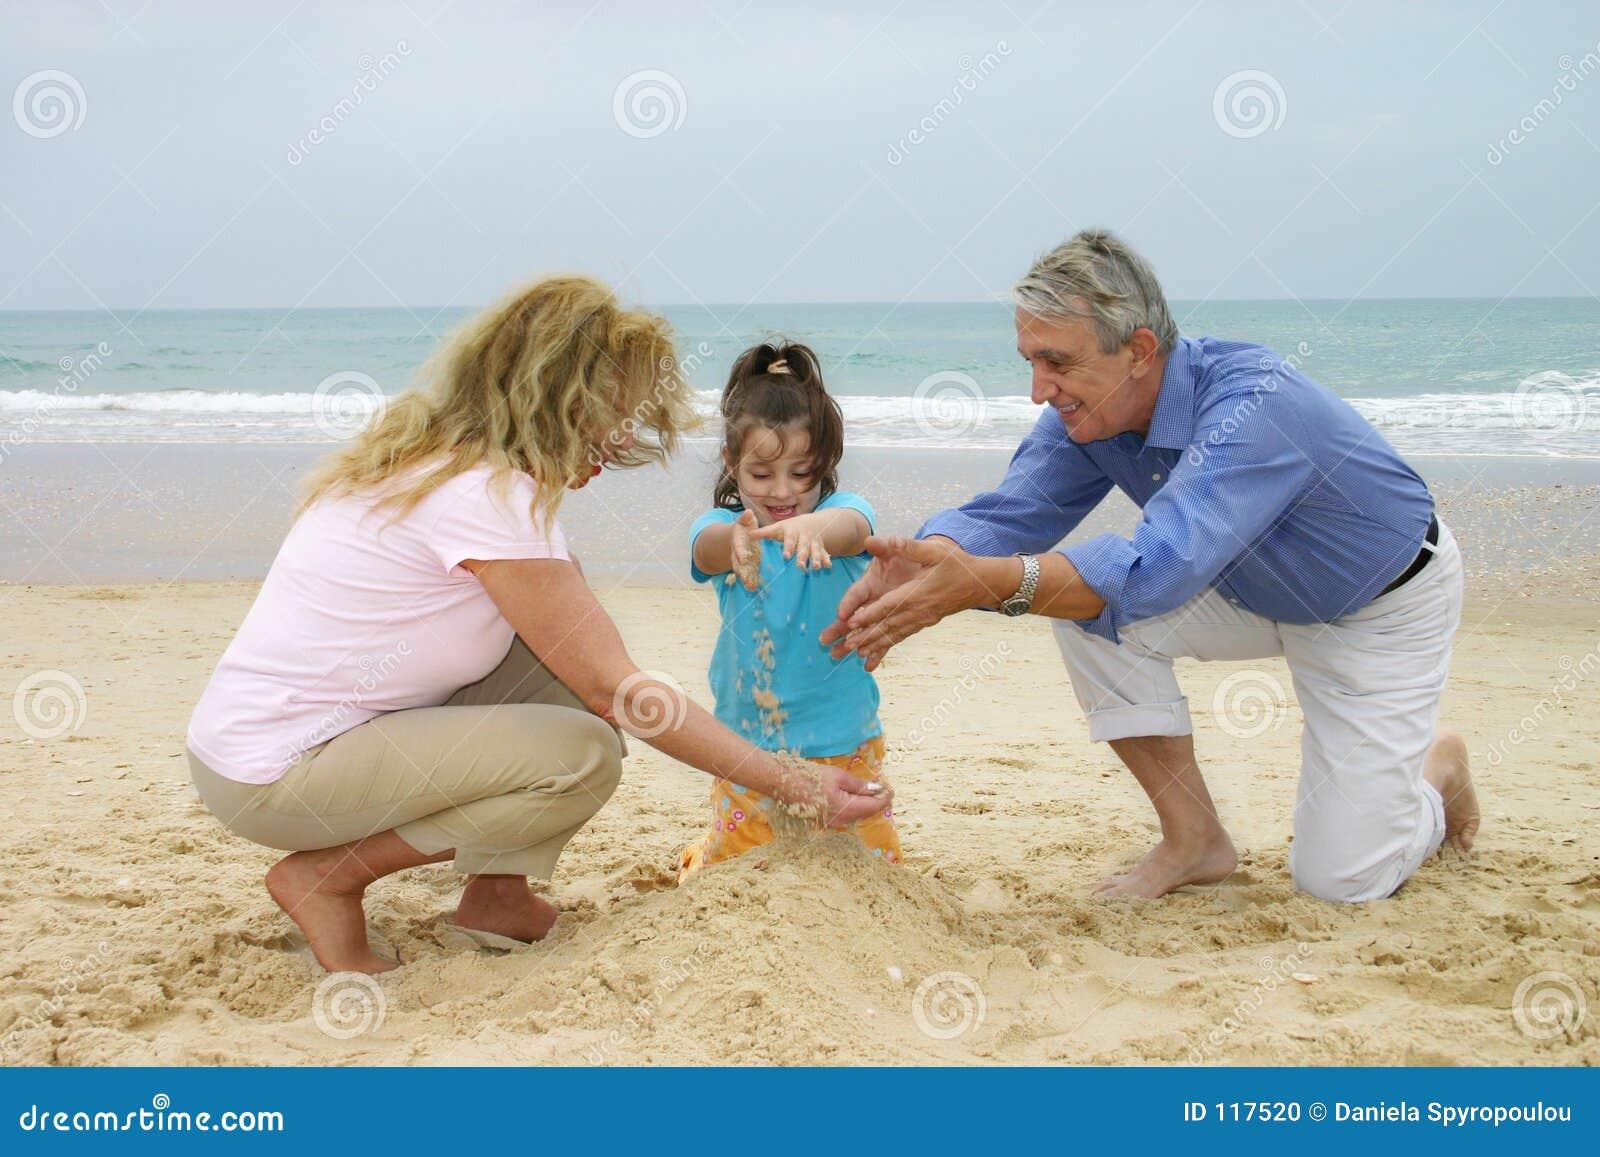 Divertimento da praia